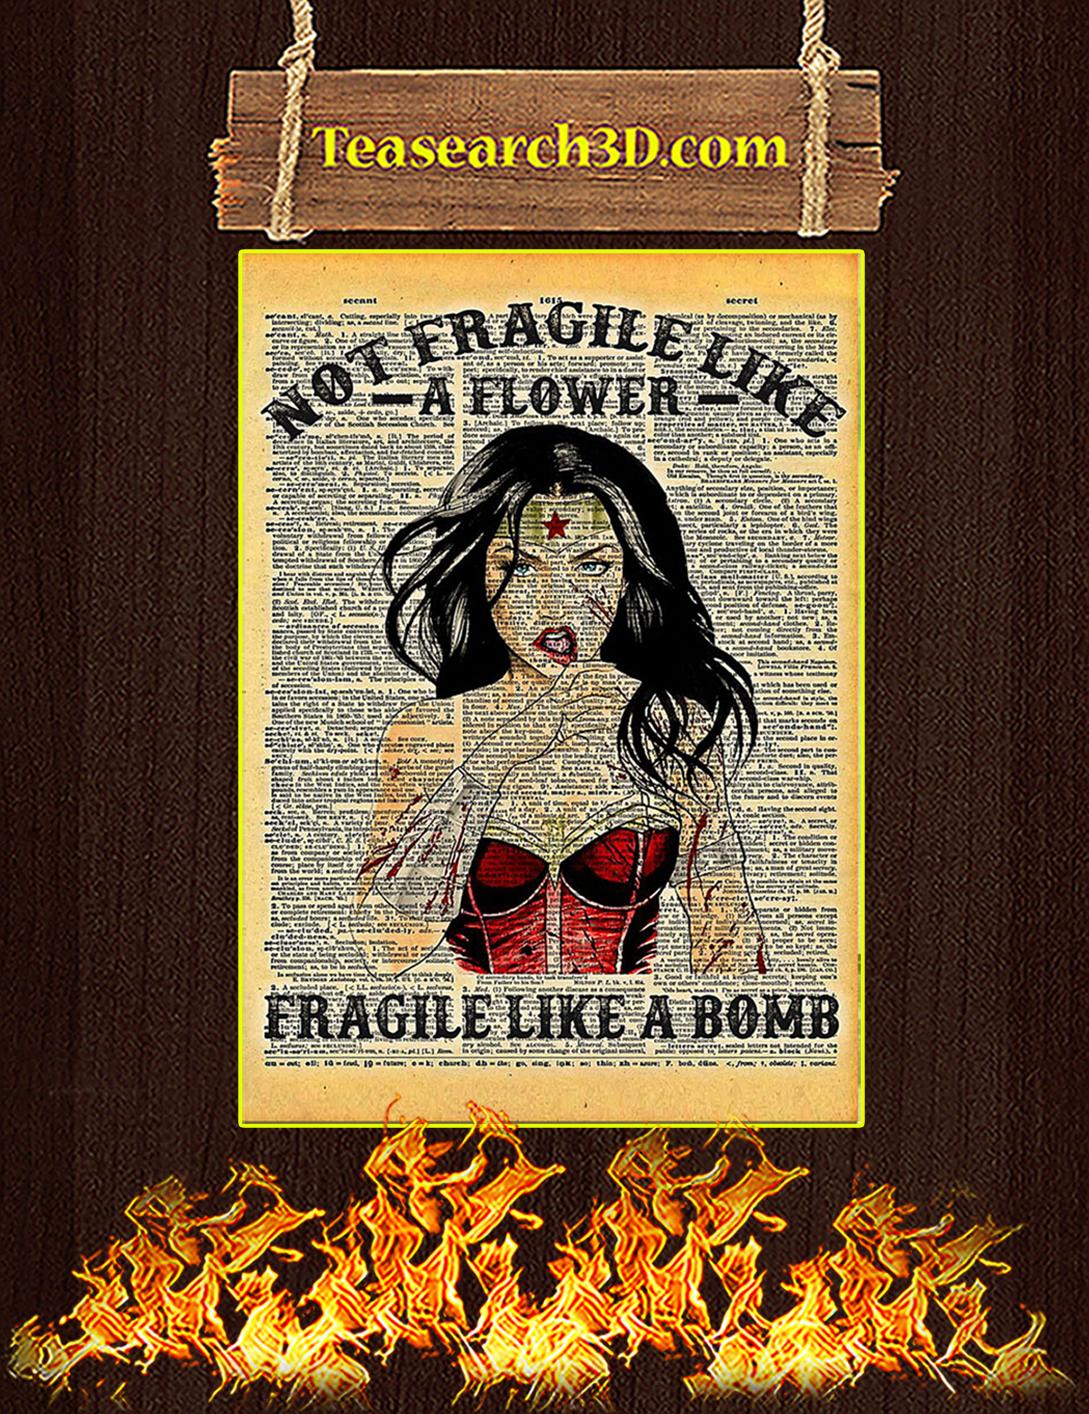 Wonder woman not fragile like a flower fragile like a bomb poster A2